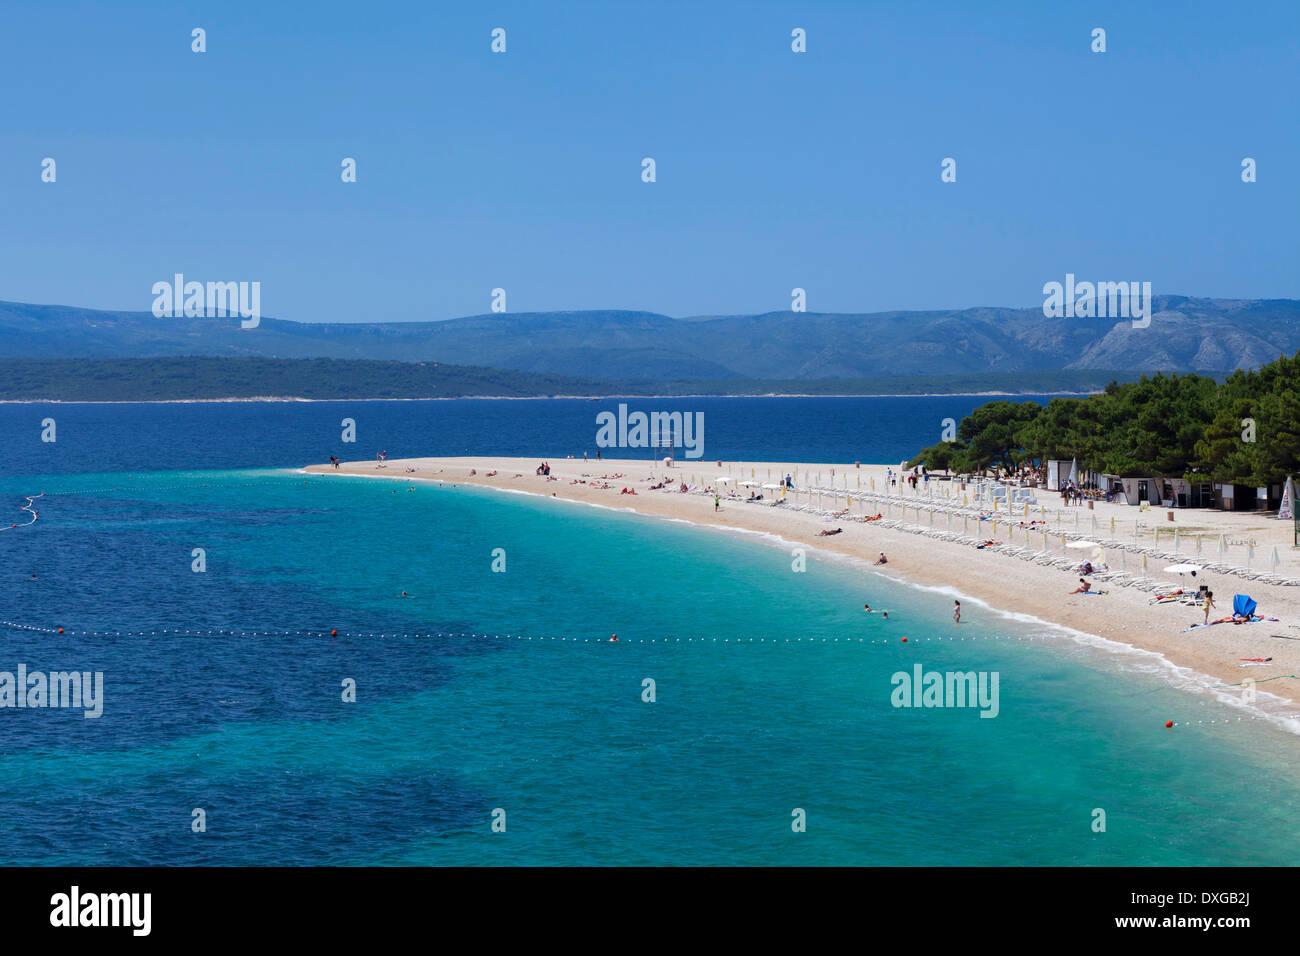 Beach at Zlatni Rat or Golden Horn, island of Hvar at the back, Bol, Island of Brač, Dalmatia, Croatia - Stock Image